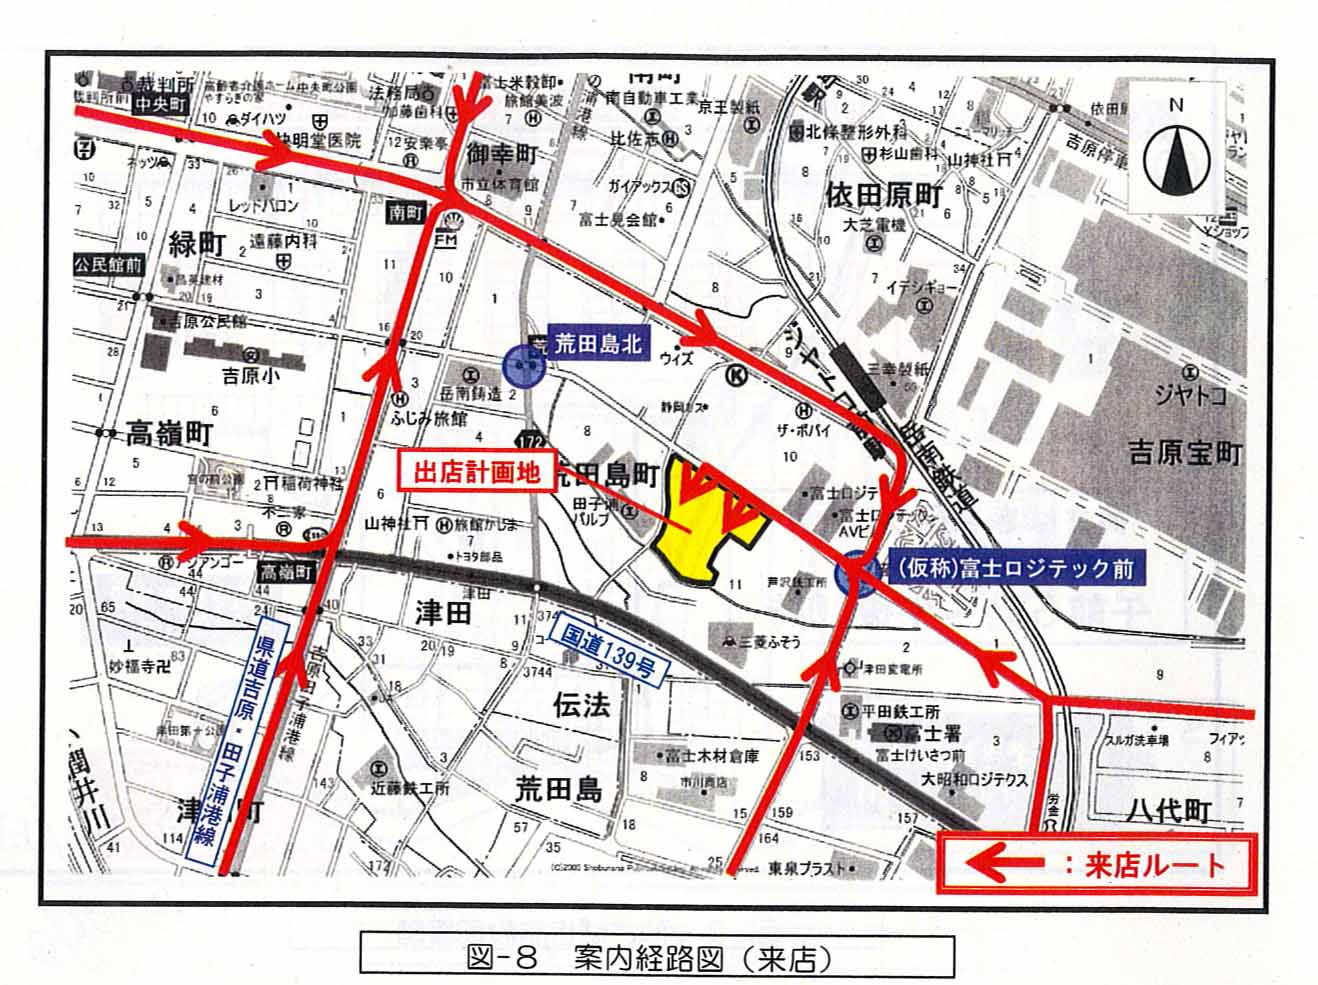 マックスバリュ富士荒田島店 出店説明会_f0141310_22122418.jpg